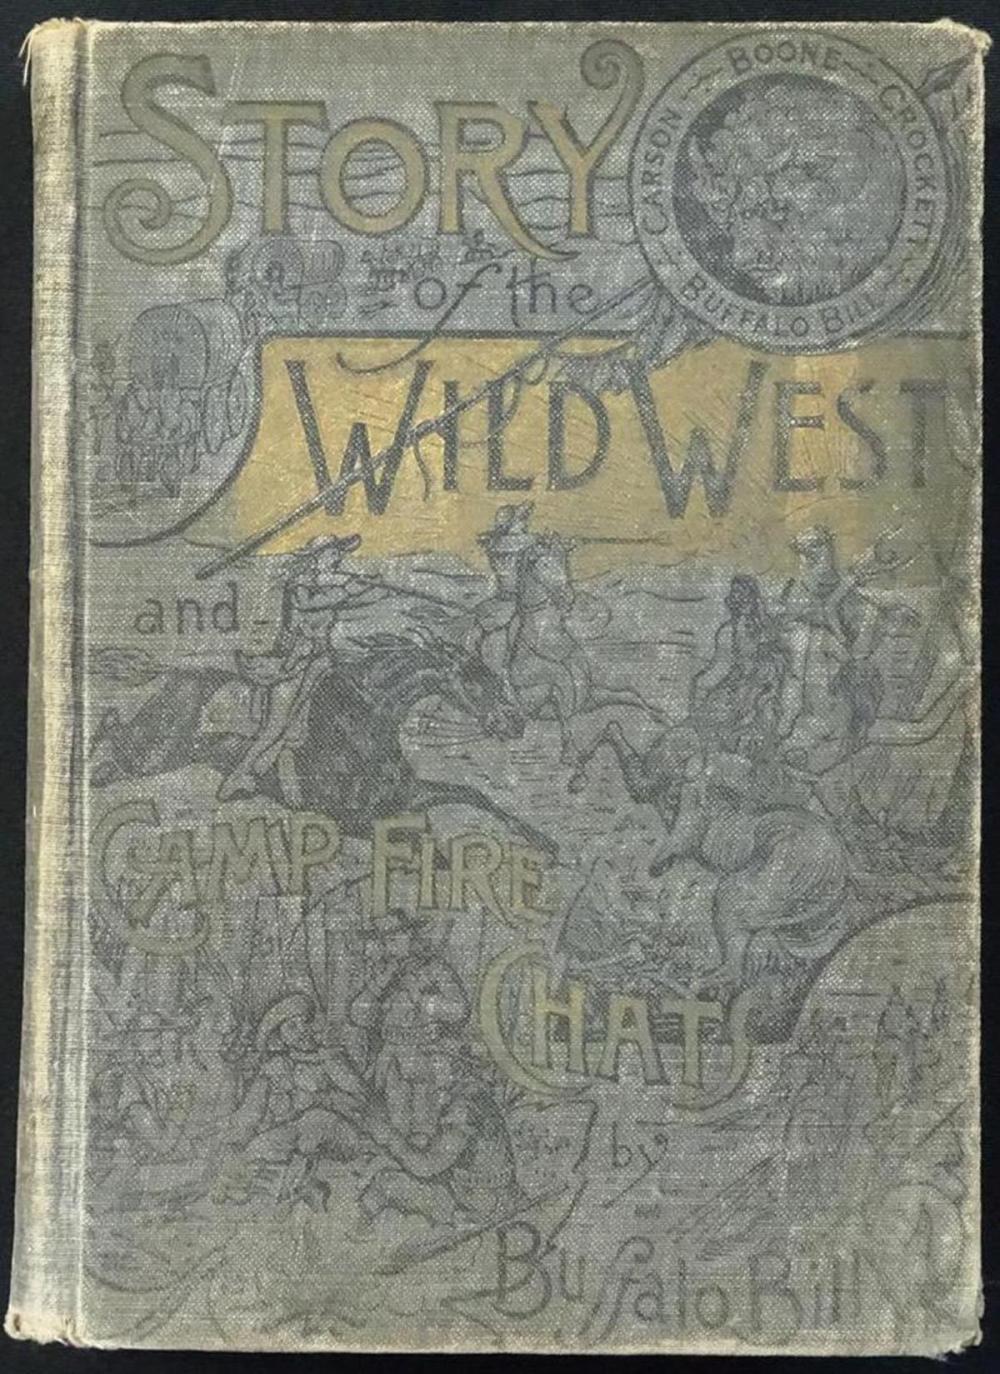 1902 BUFFALO BILL ILLUSTRATED BOOK